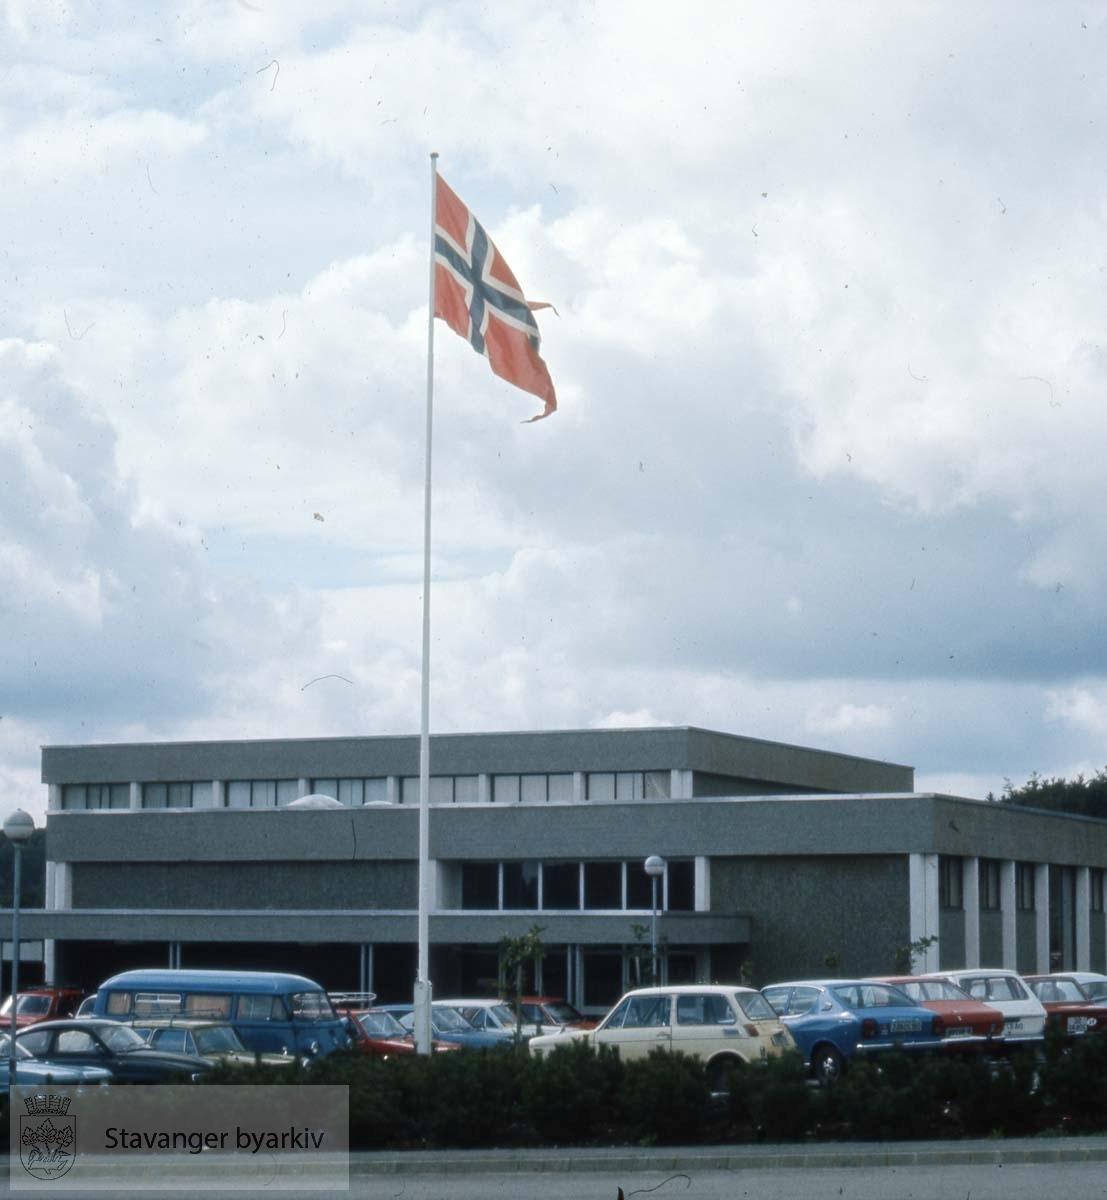 Stavanger Lærerhøgskole